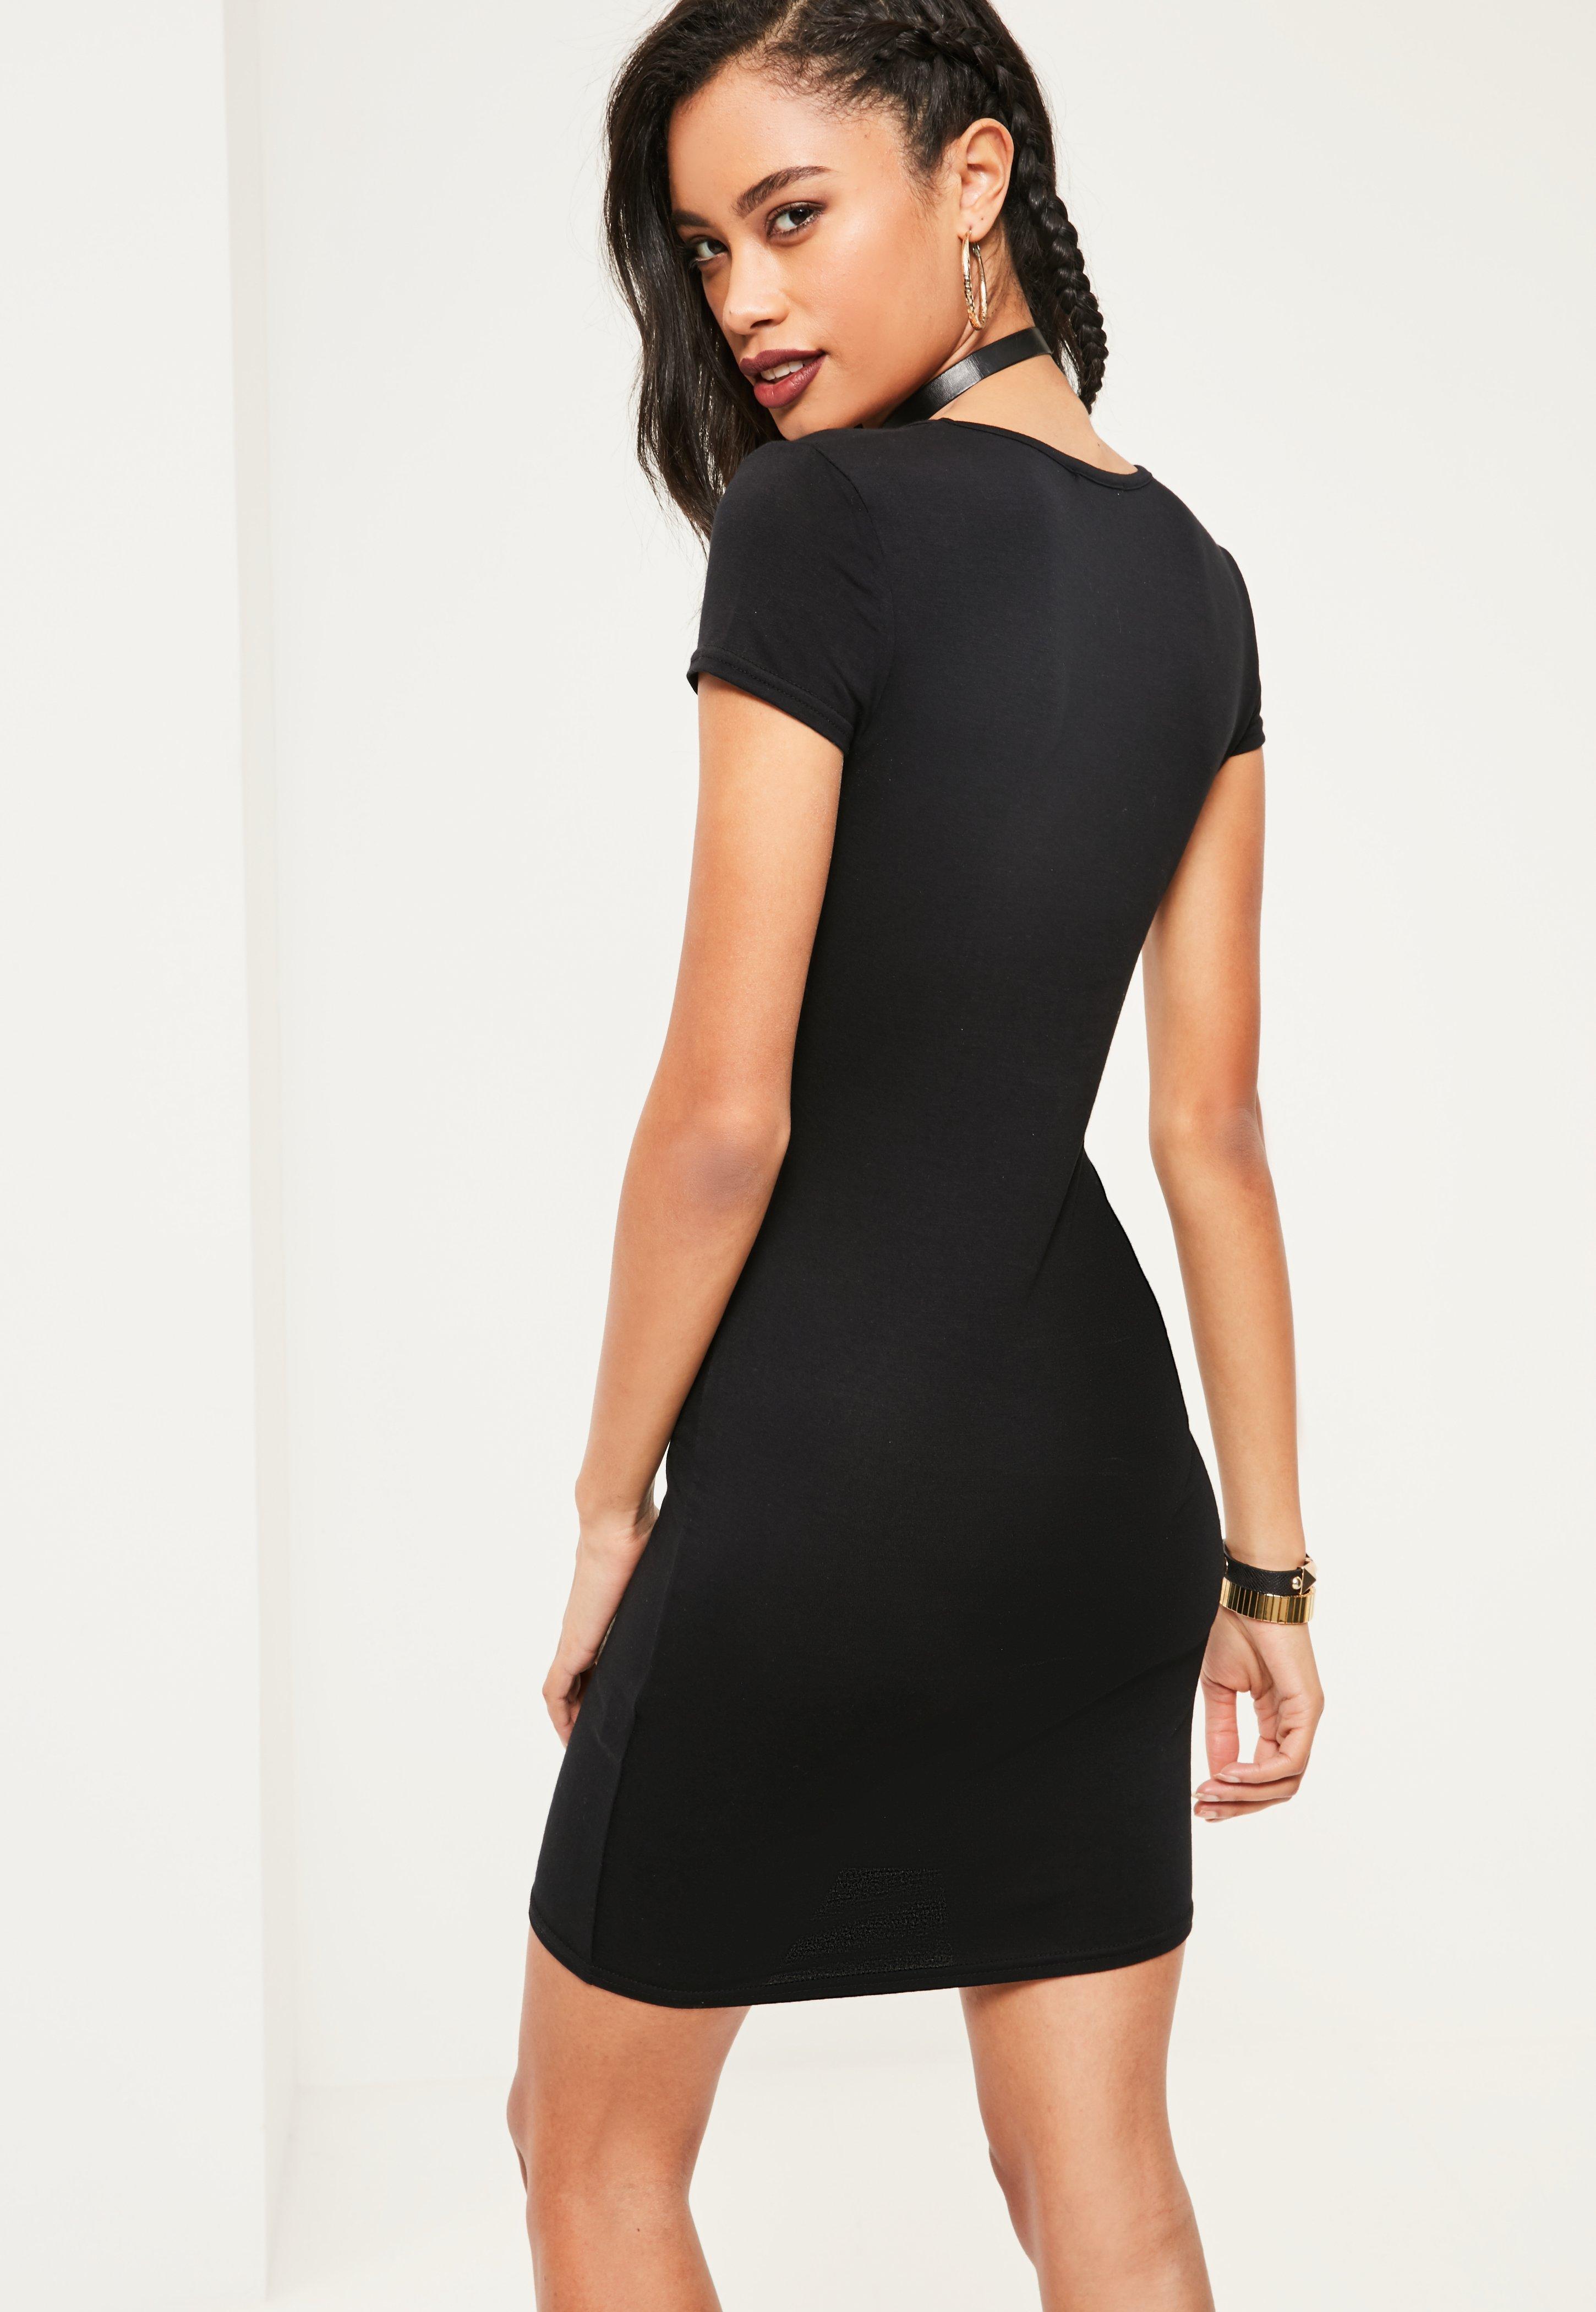 Black Cap Sleeve V Neck Bodycon Dress